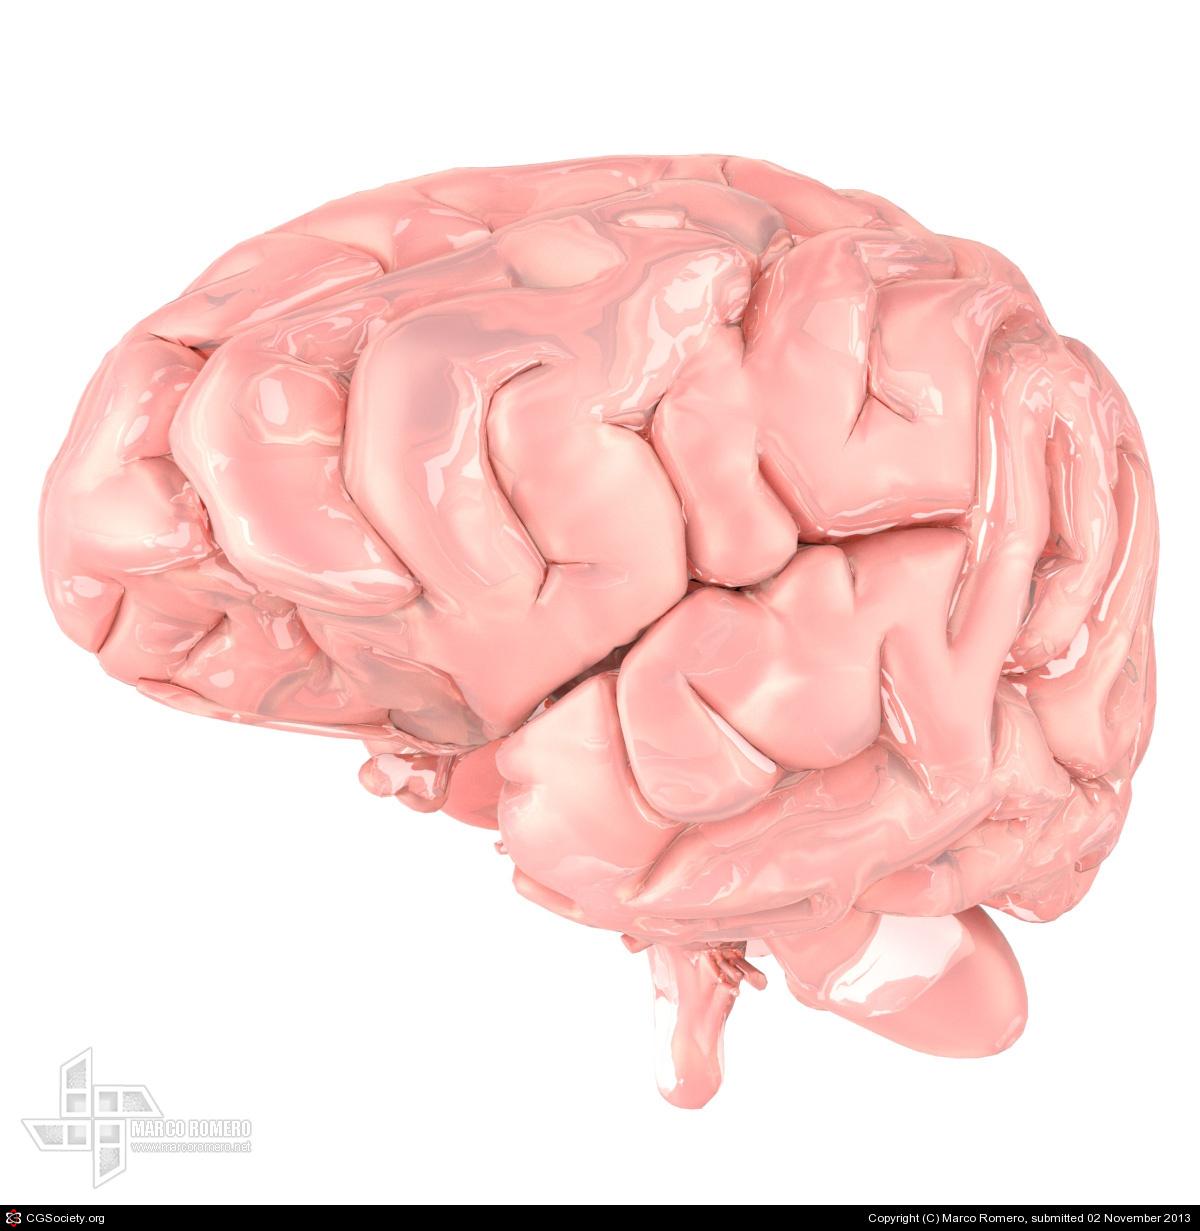 Maromero human brain 1 ee572c21 5qv0